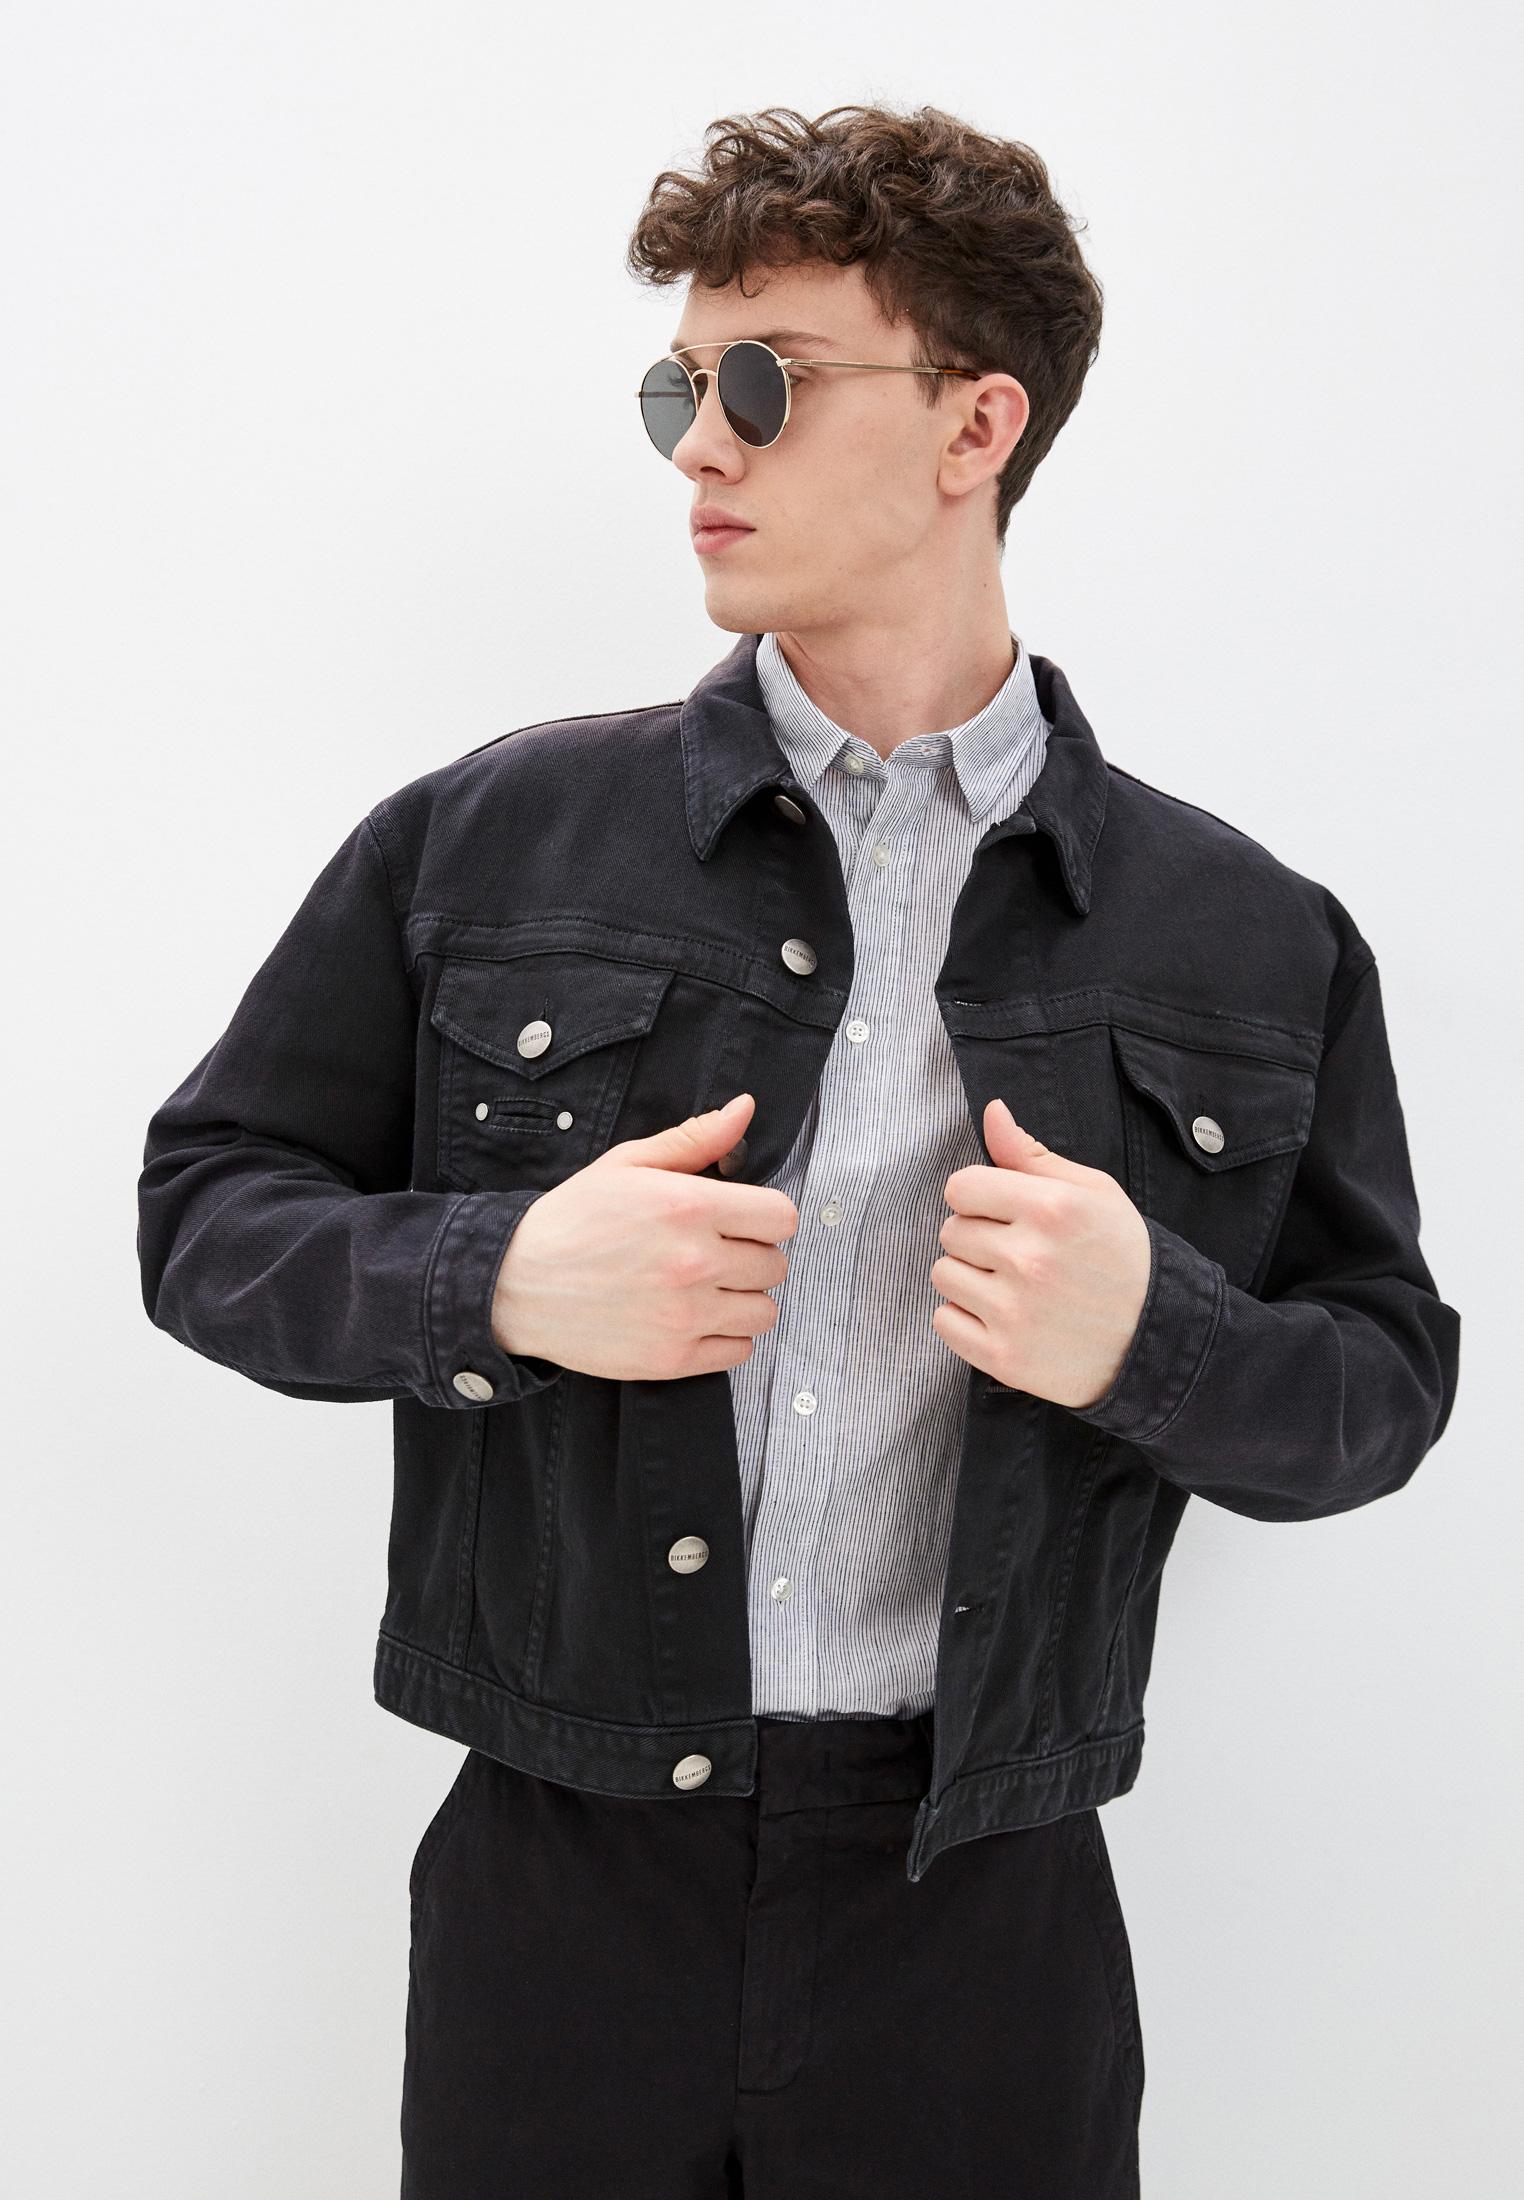 Джинсовая куртка Bikkembergs (Биккембергс) C H 103 70 S 3074